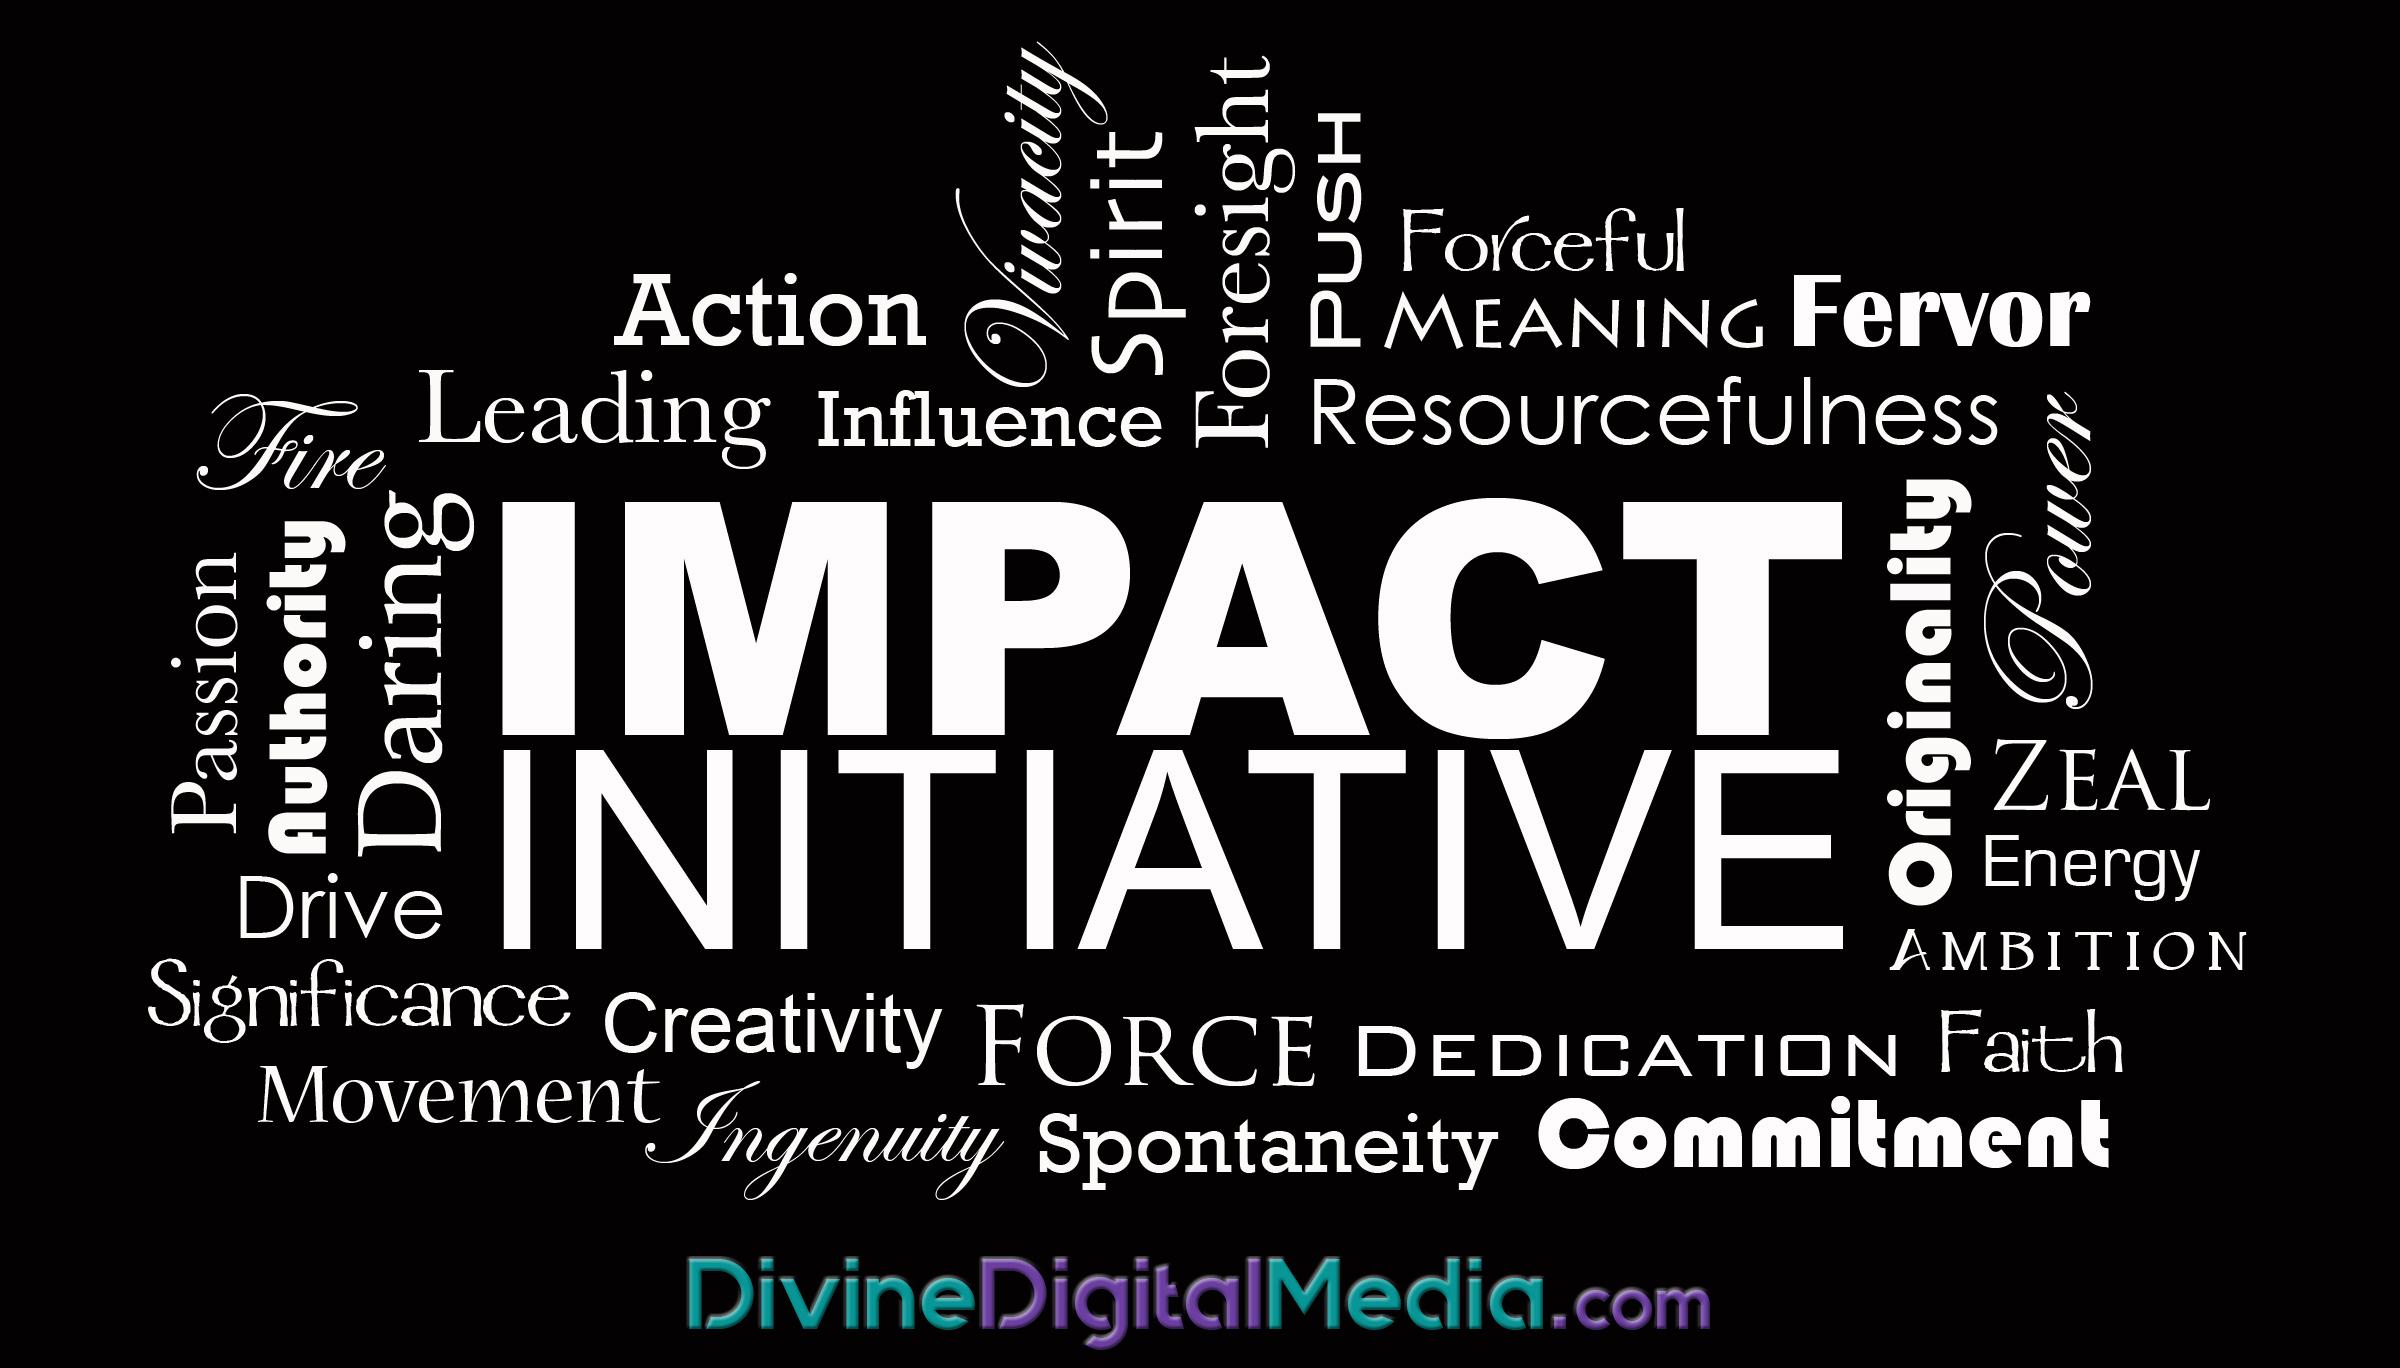 Camelot-Enterprises_Future-Impact-Initiative_Divine-Digital-Media